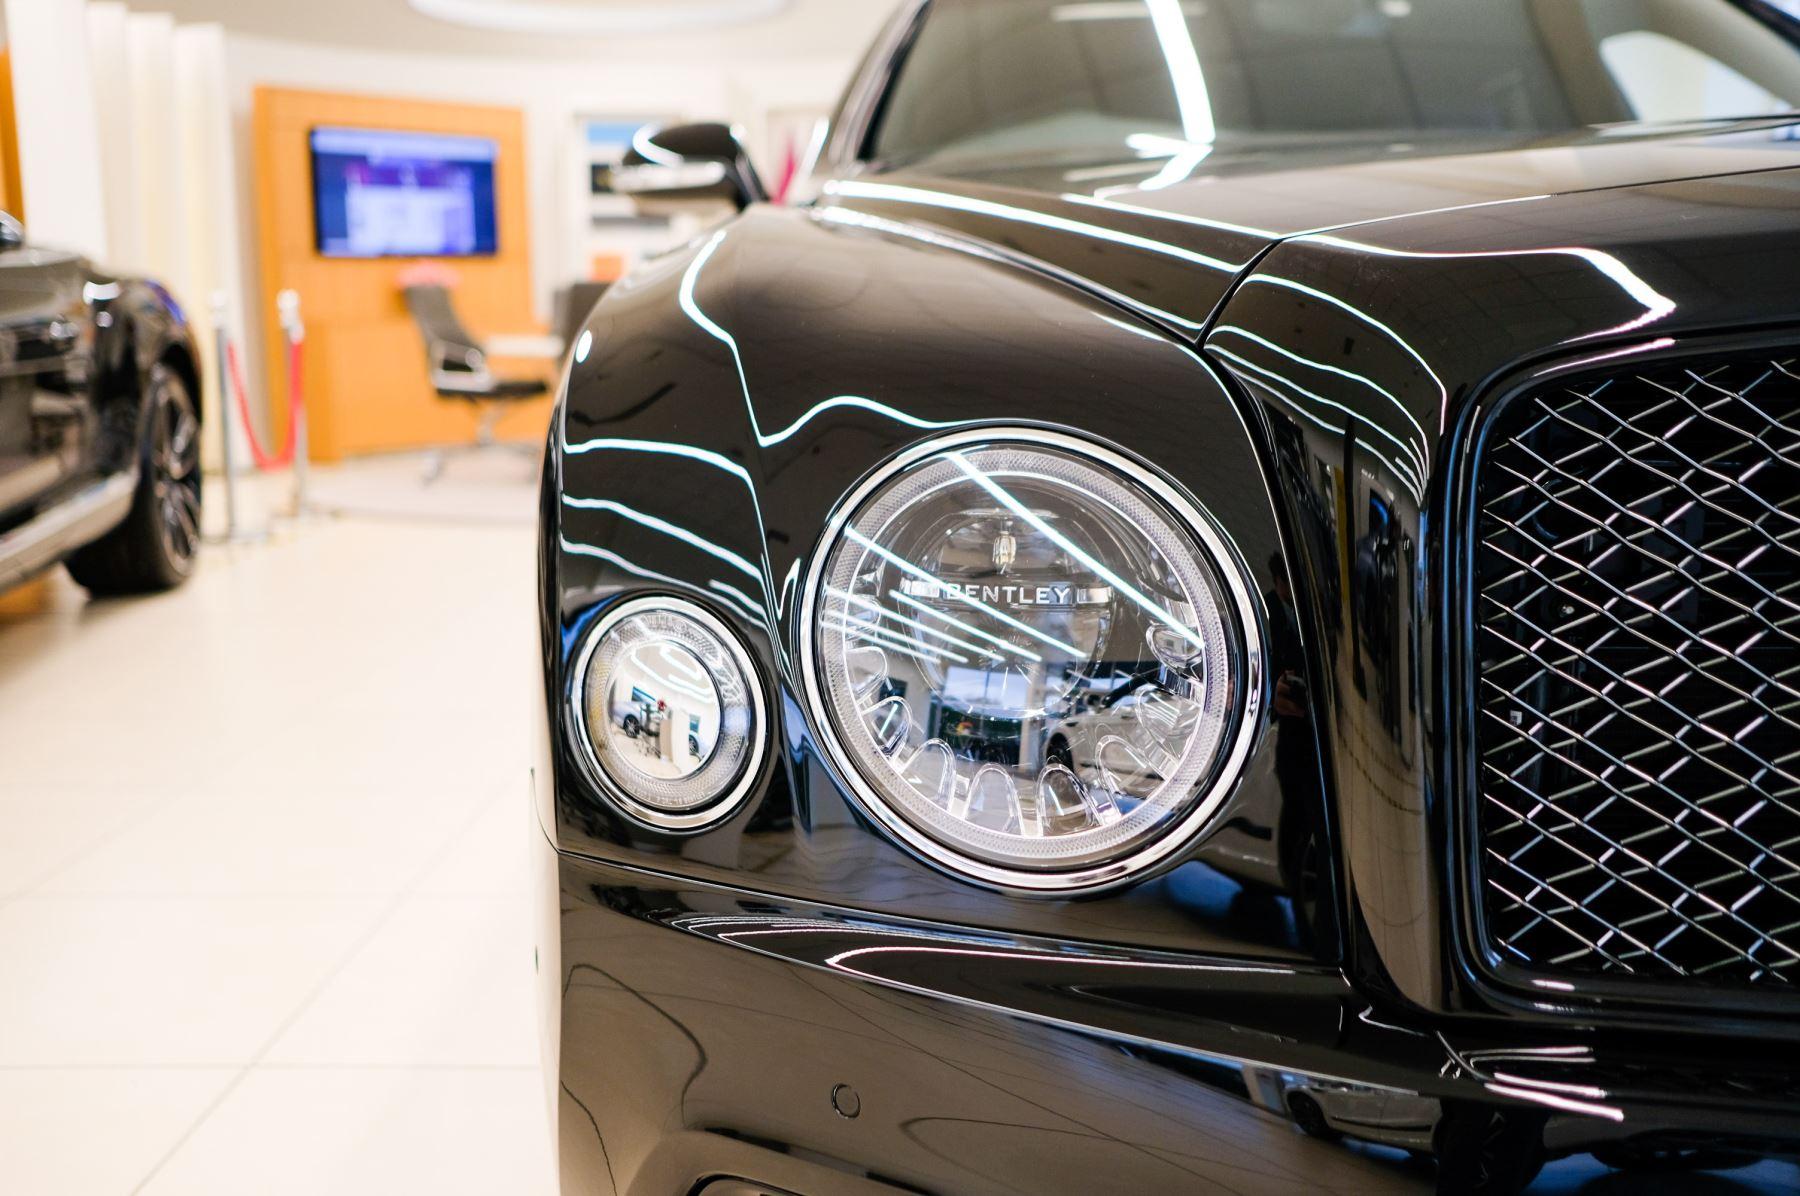 Bentley Mulsanne Mulsanne 6.75 Edition by Mulliner image 7